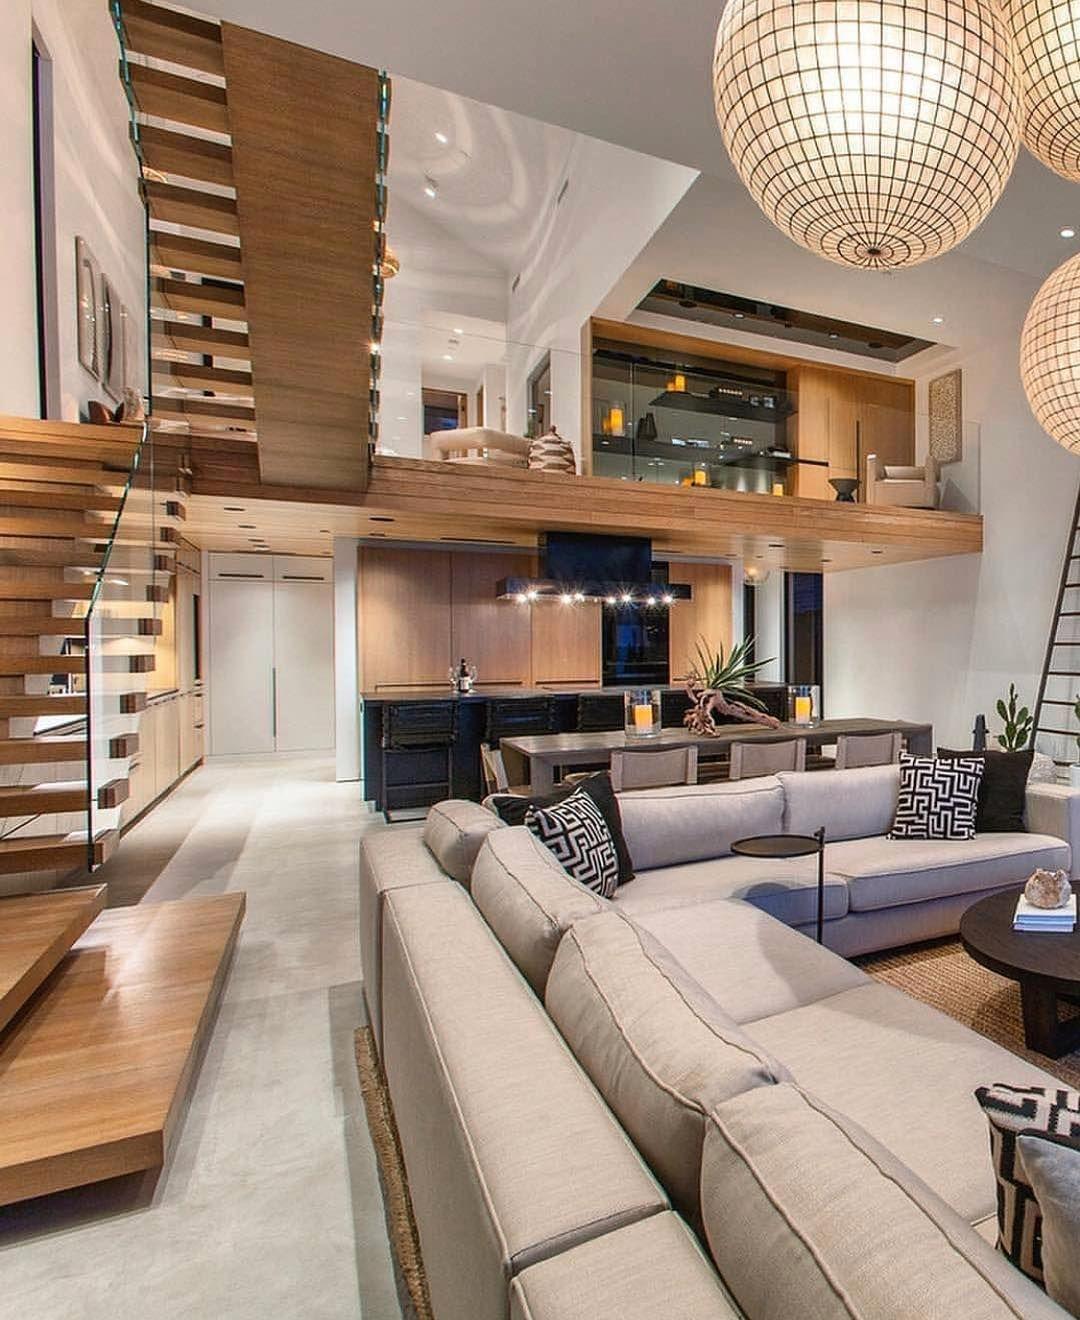 Luxury Interiors On Instagram Living Room Goals Rate 1 10 Follow Lamaisoninterior Fol Loft Design Luxury House Designs Luxury Interior